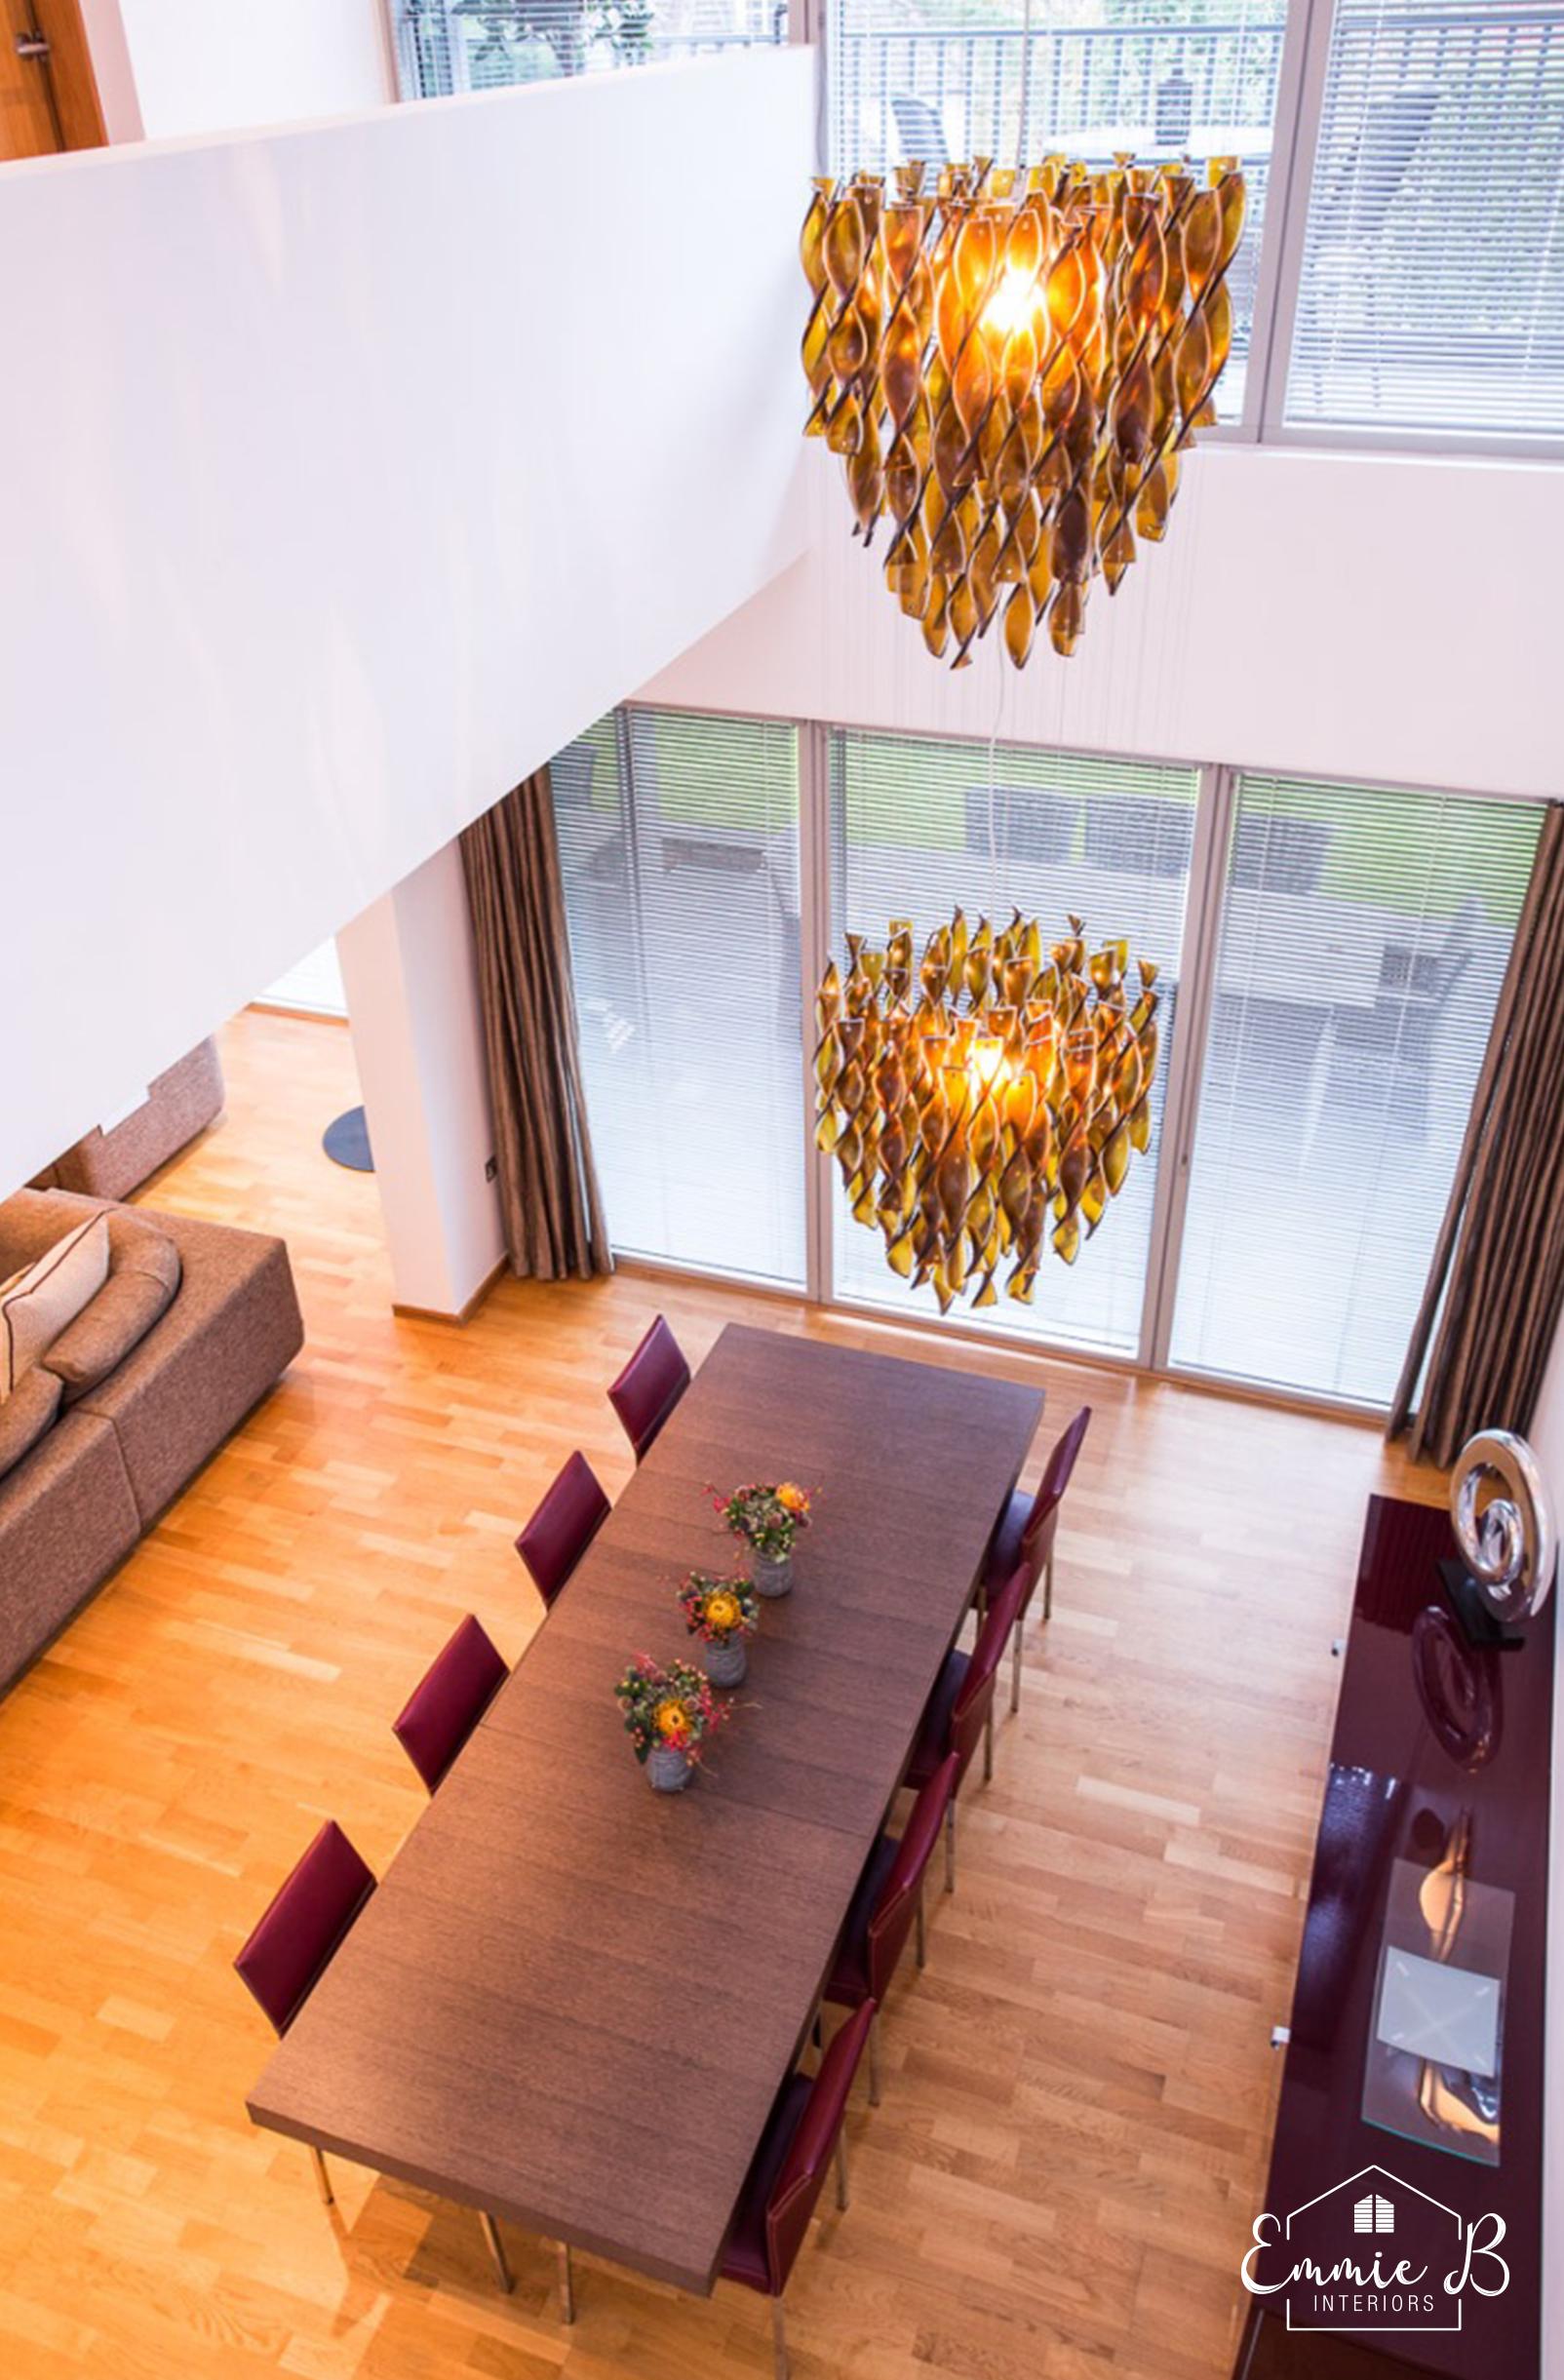 living space interior design Cheshire